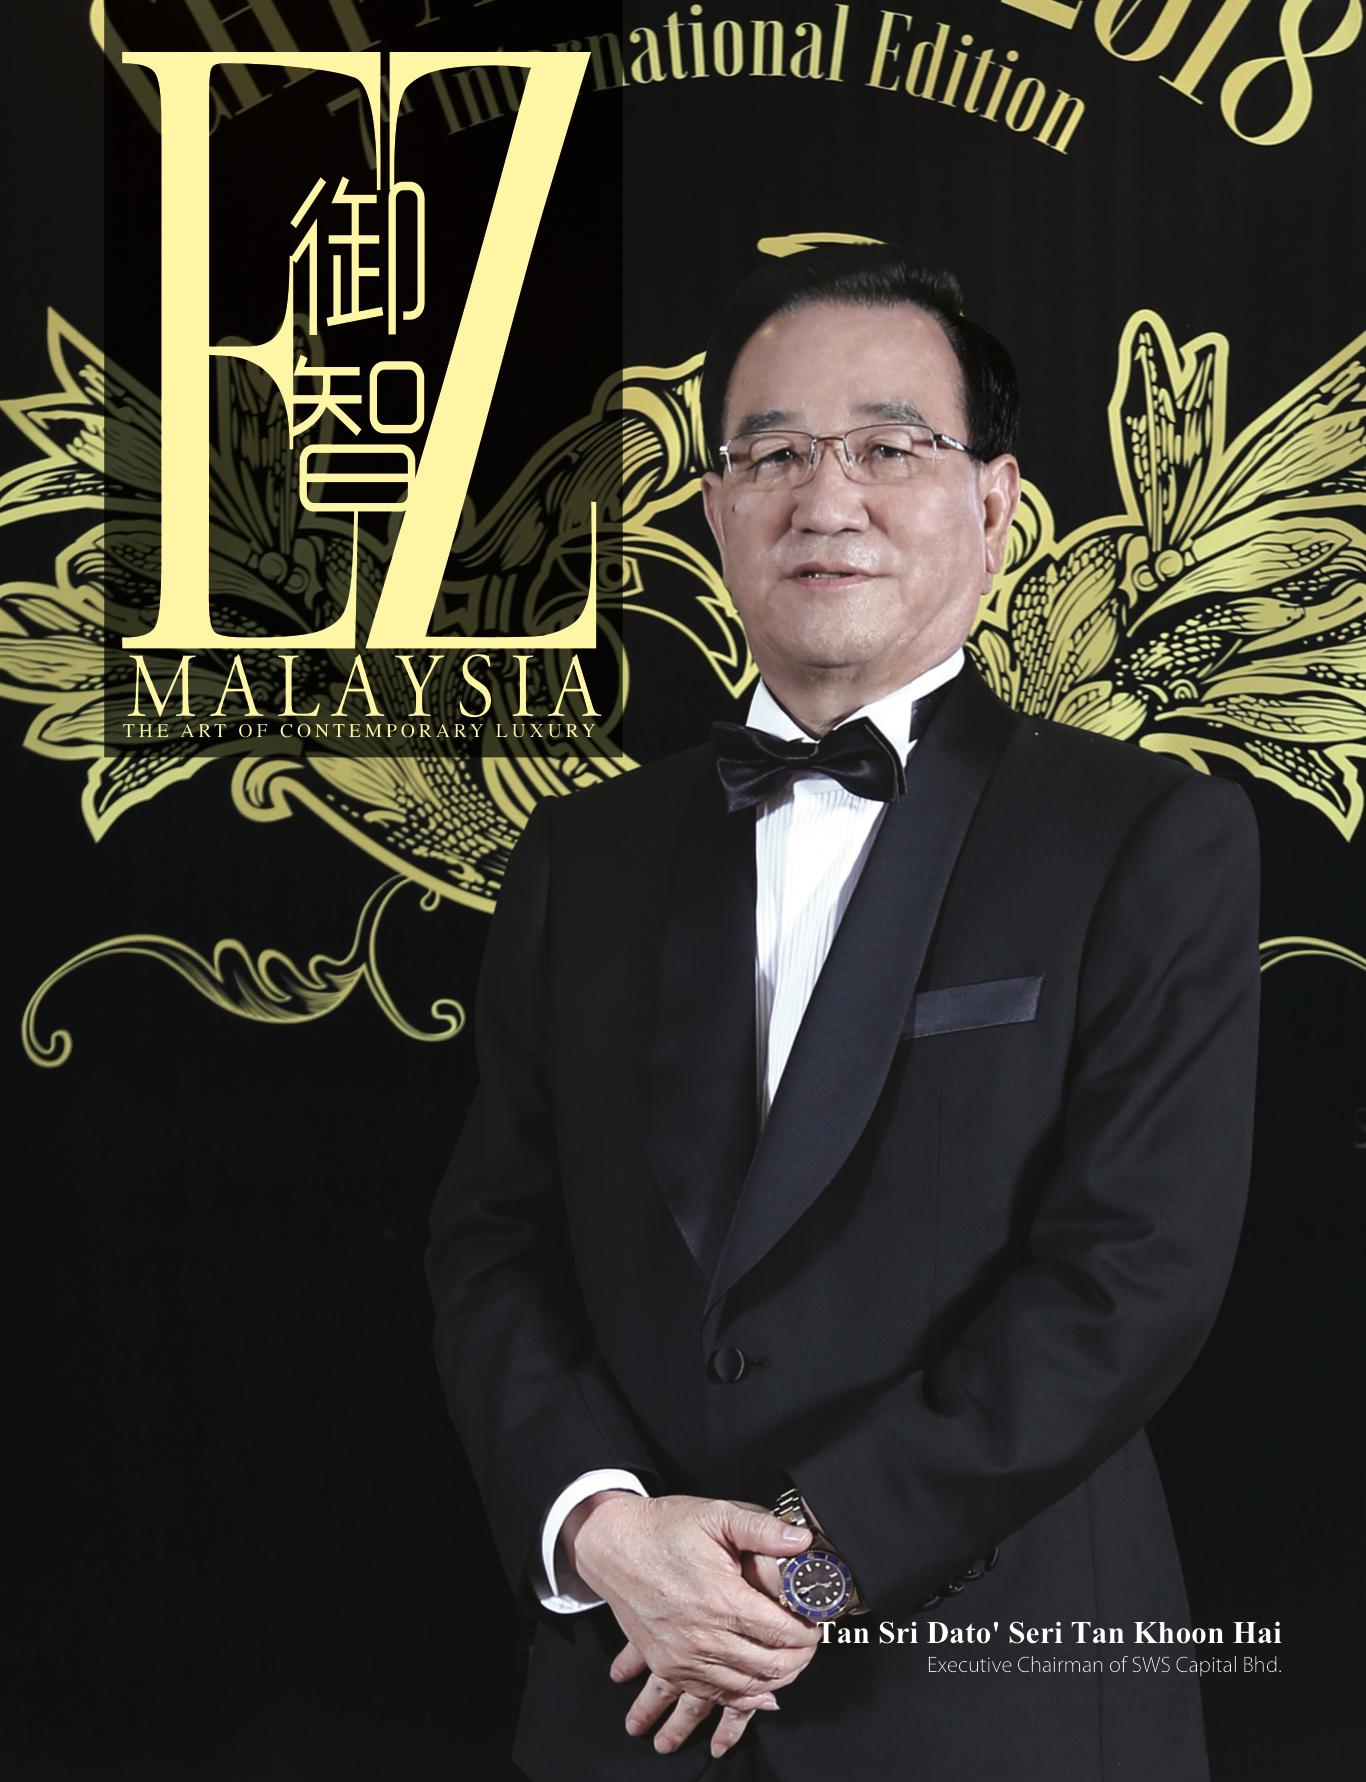 Tan Sri Dato Seri Tan Khoon Hai